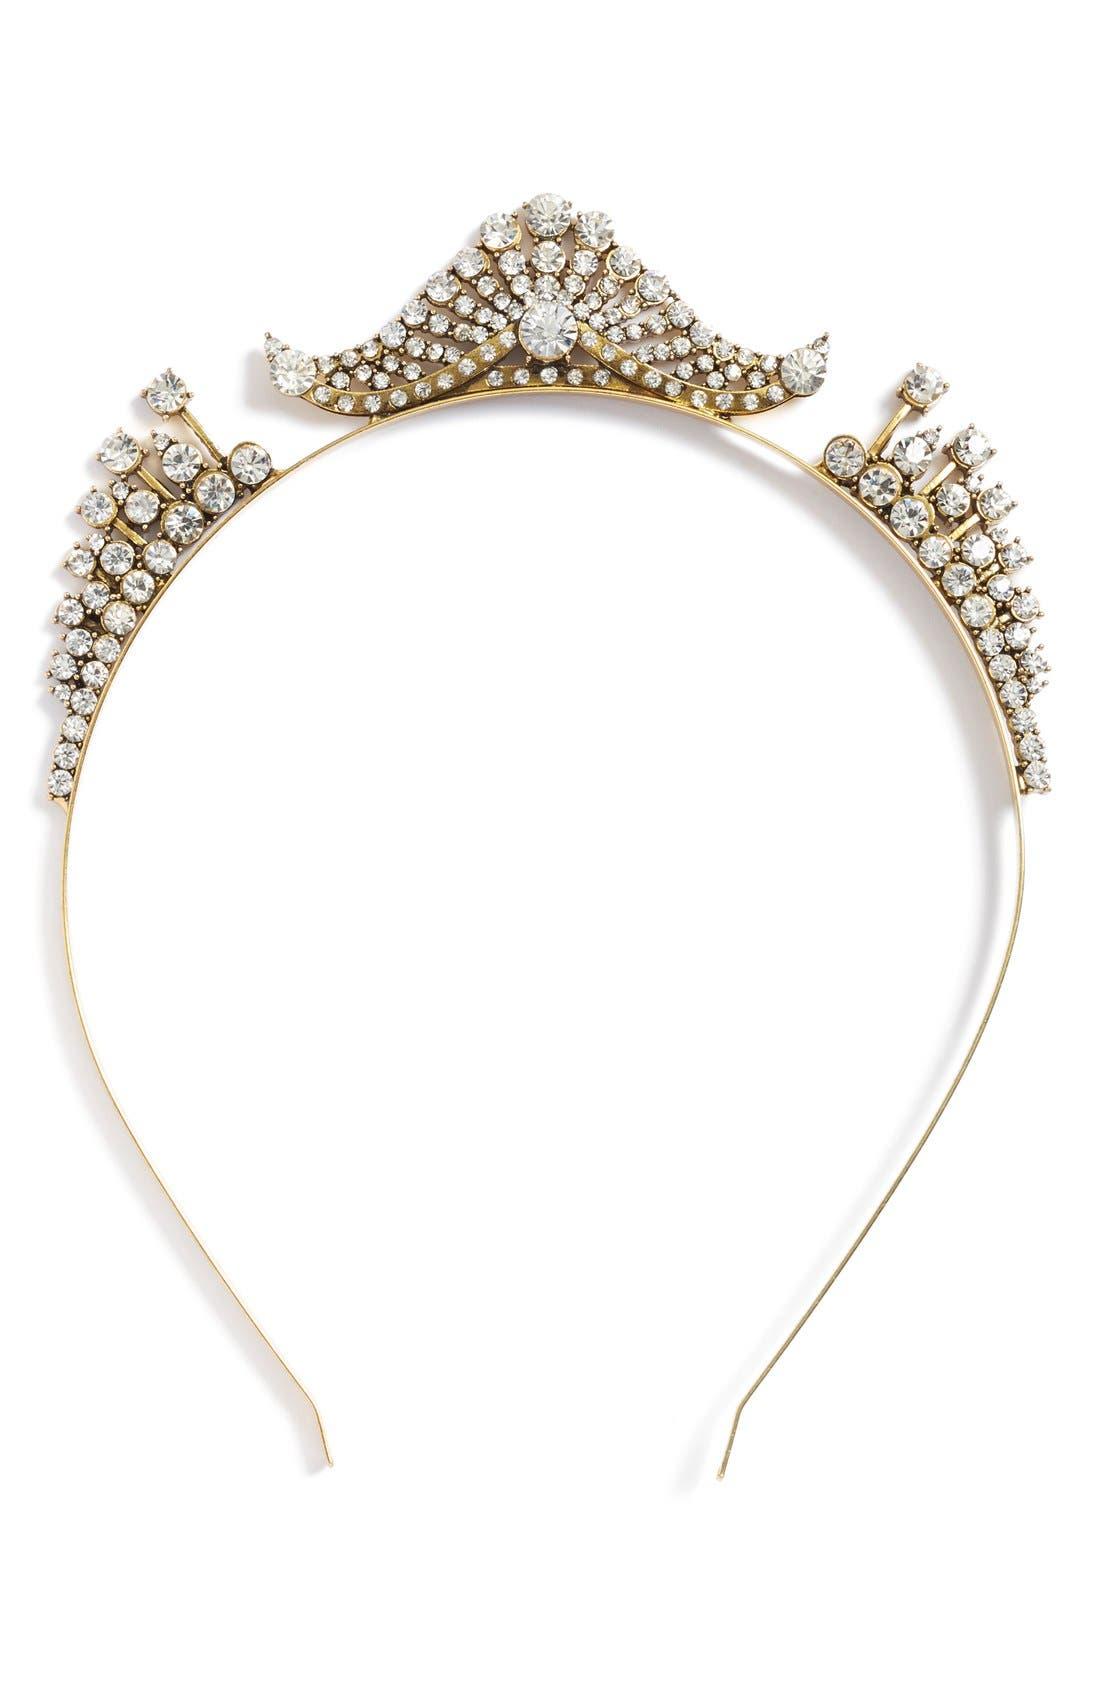 Alternate Image 3  - Untamed Petals by Amanda Judge x Meredith Markworth-Pollack 'Sparkler Tiara' Gilded Headband